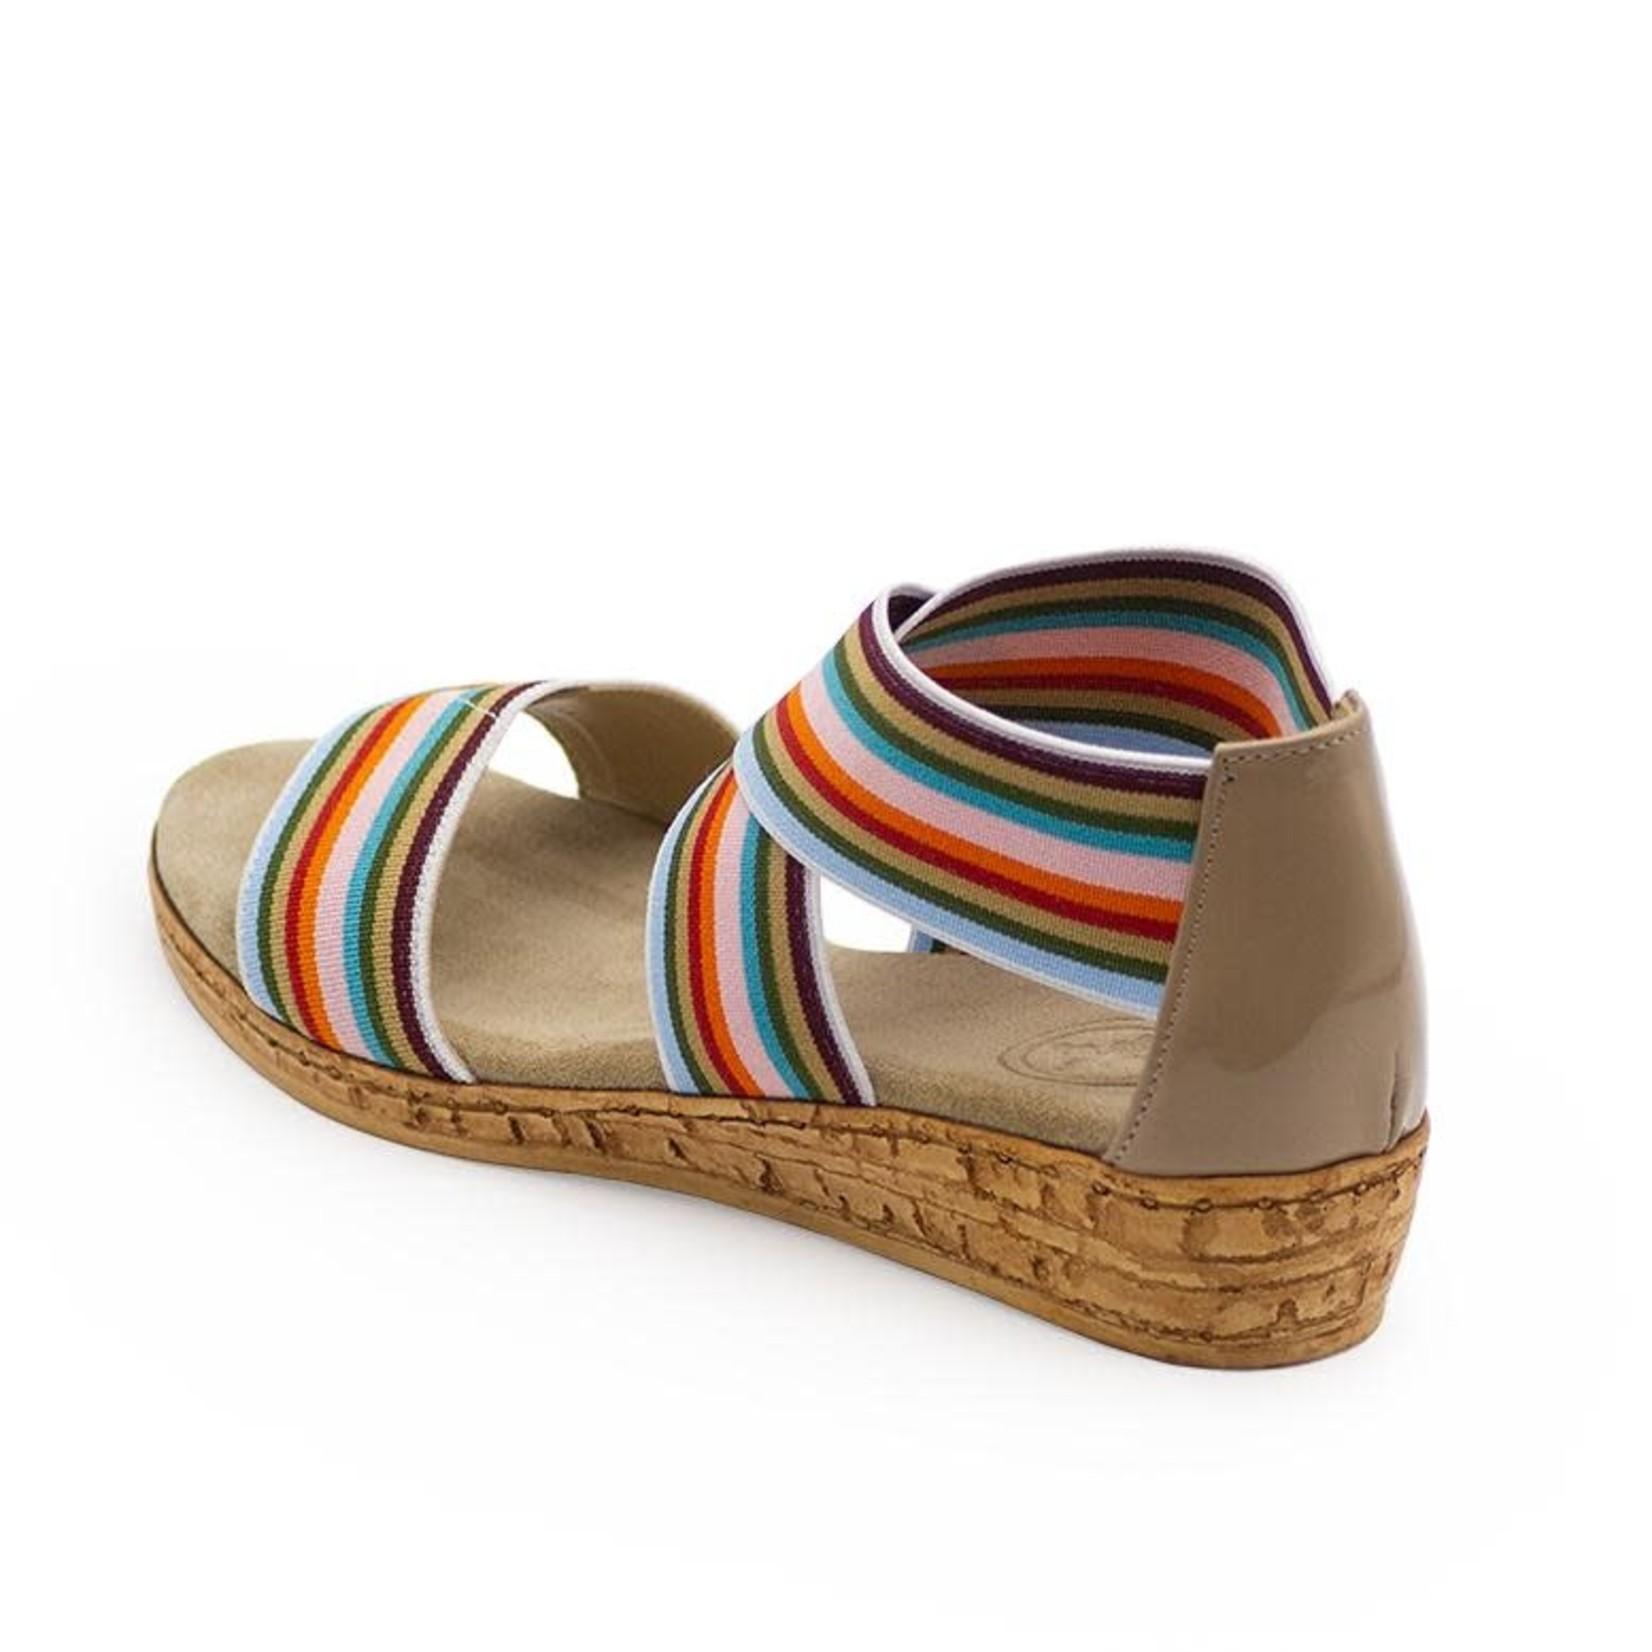 Peri Shoe in Multi Stripe 7